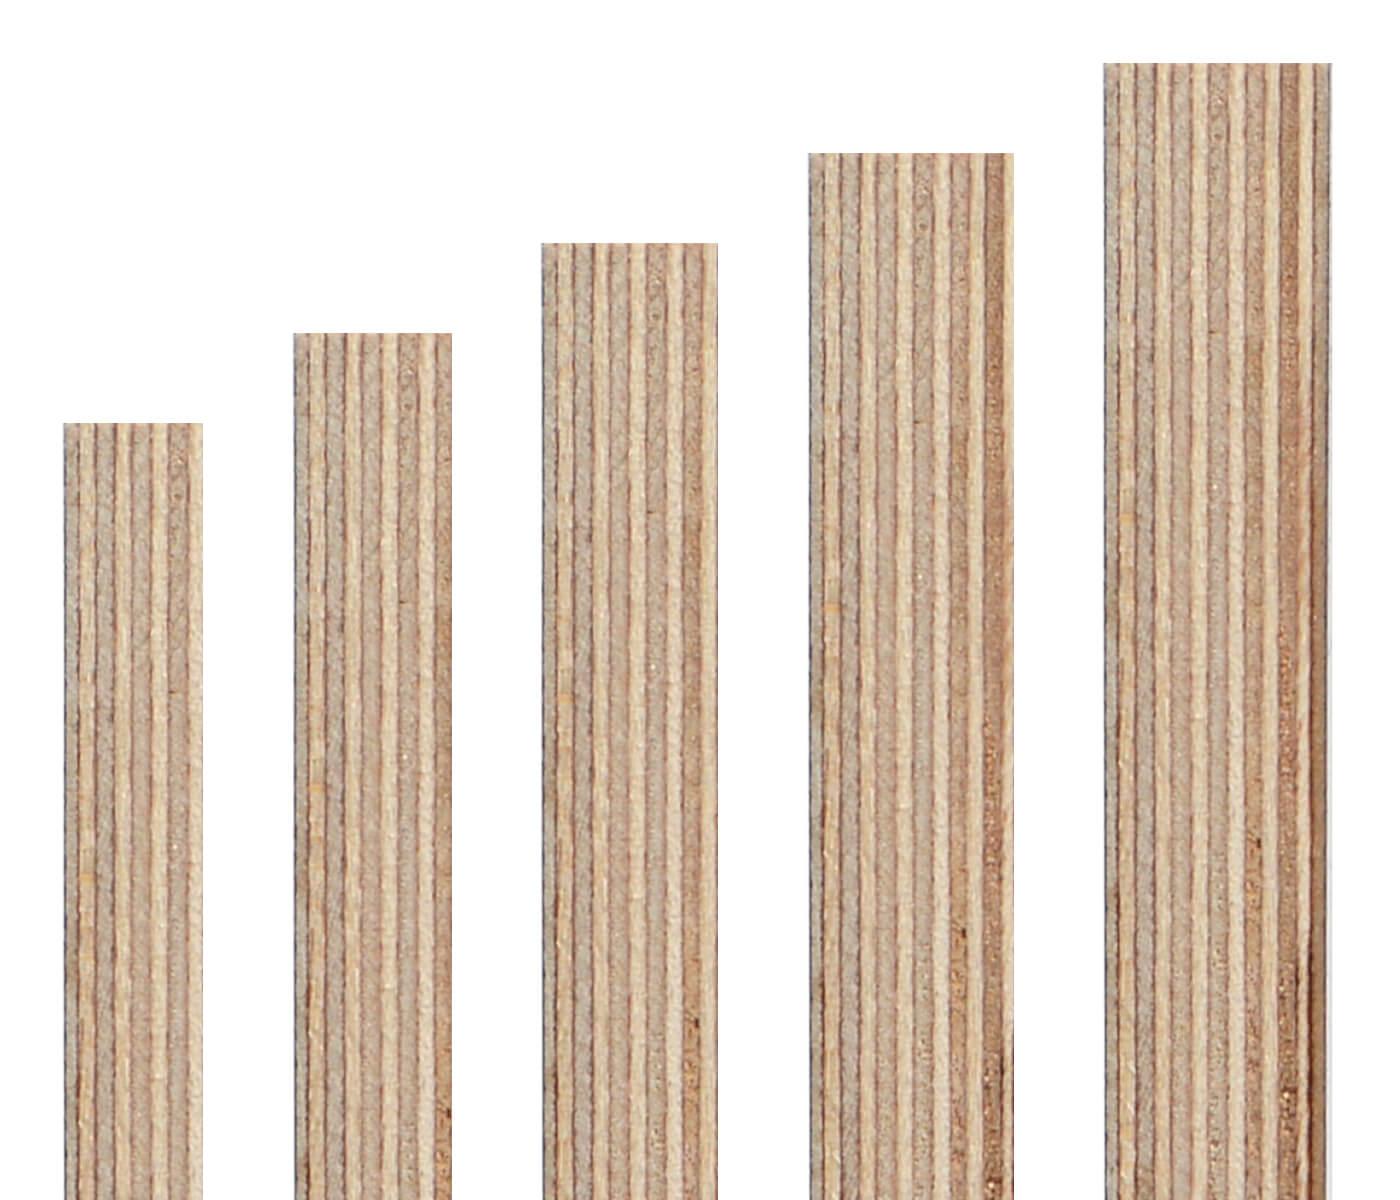 120x50 cm 12mm Multiplex Zuschnitt wei/ß melaminbeschichtet L/änge bis 200cm Multiplexplatten Zuschnitte Auswahl